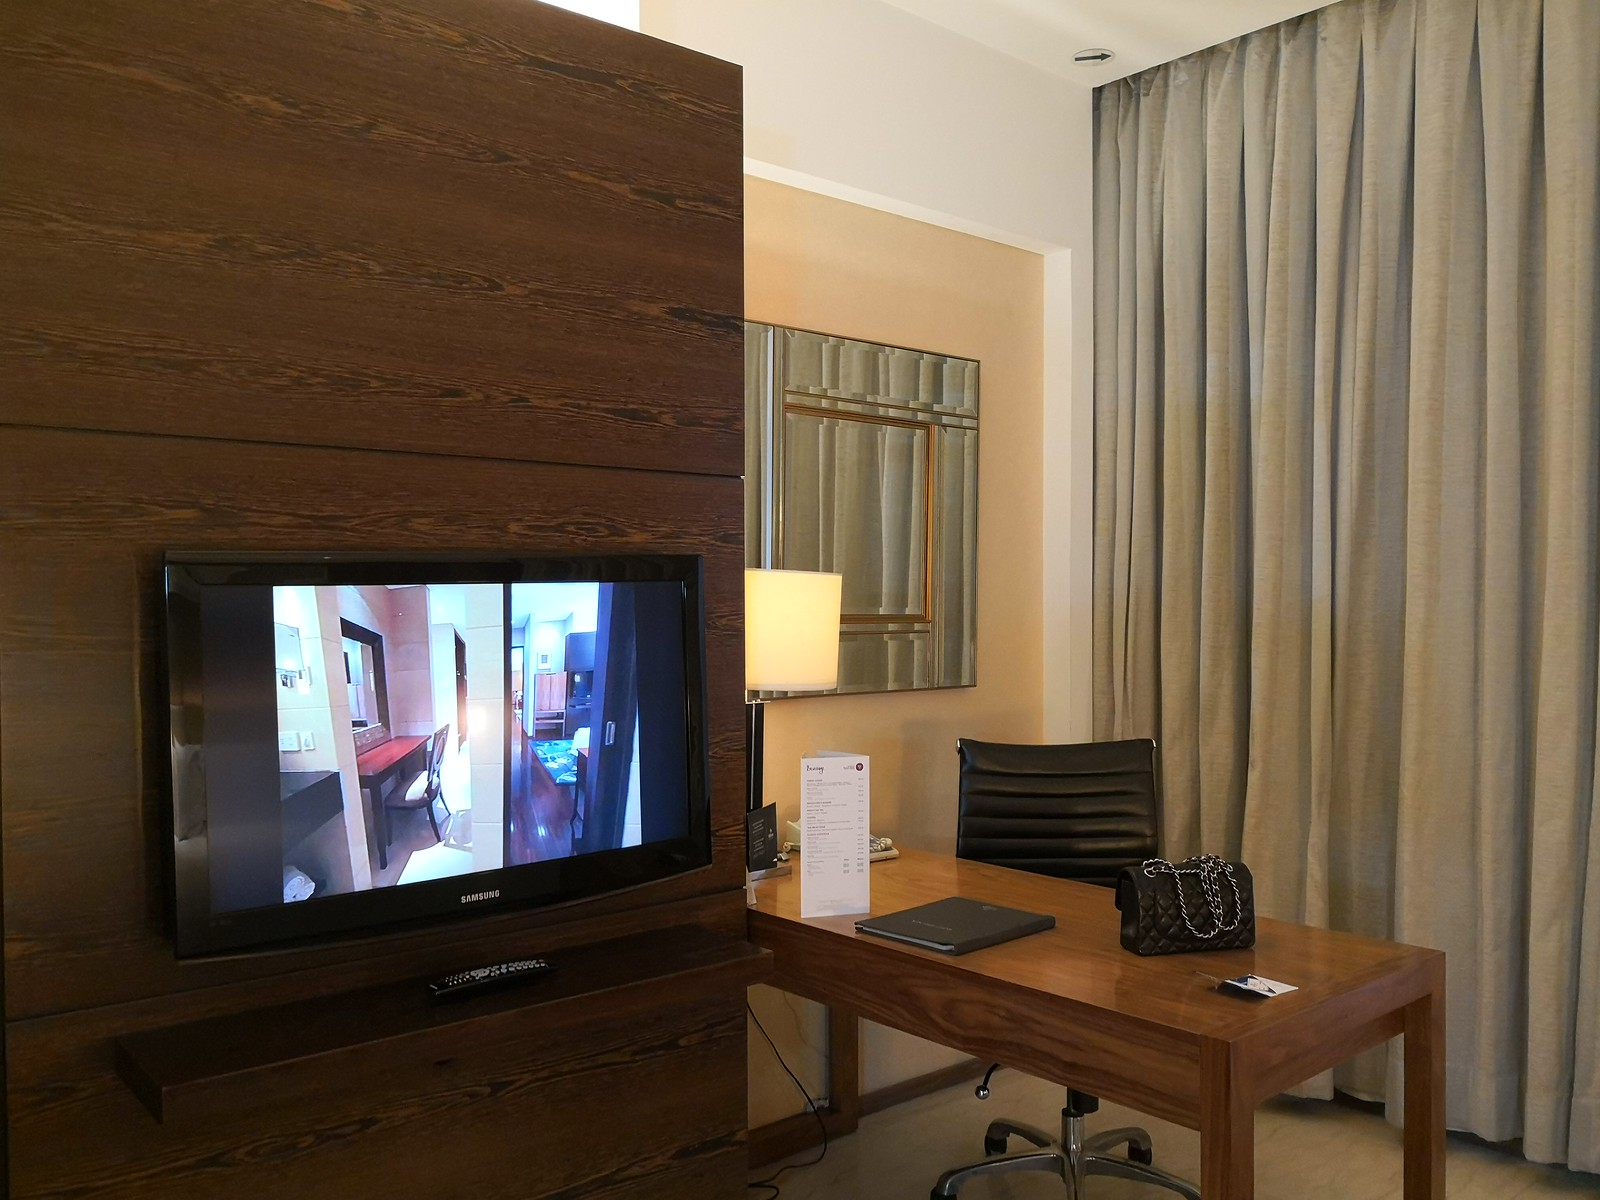 Desk and flatscreen TV